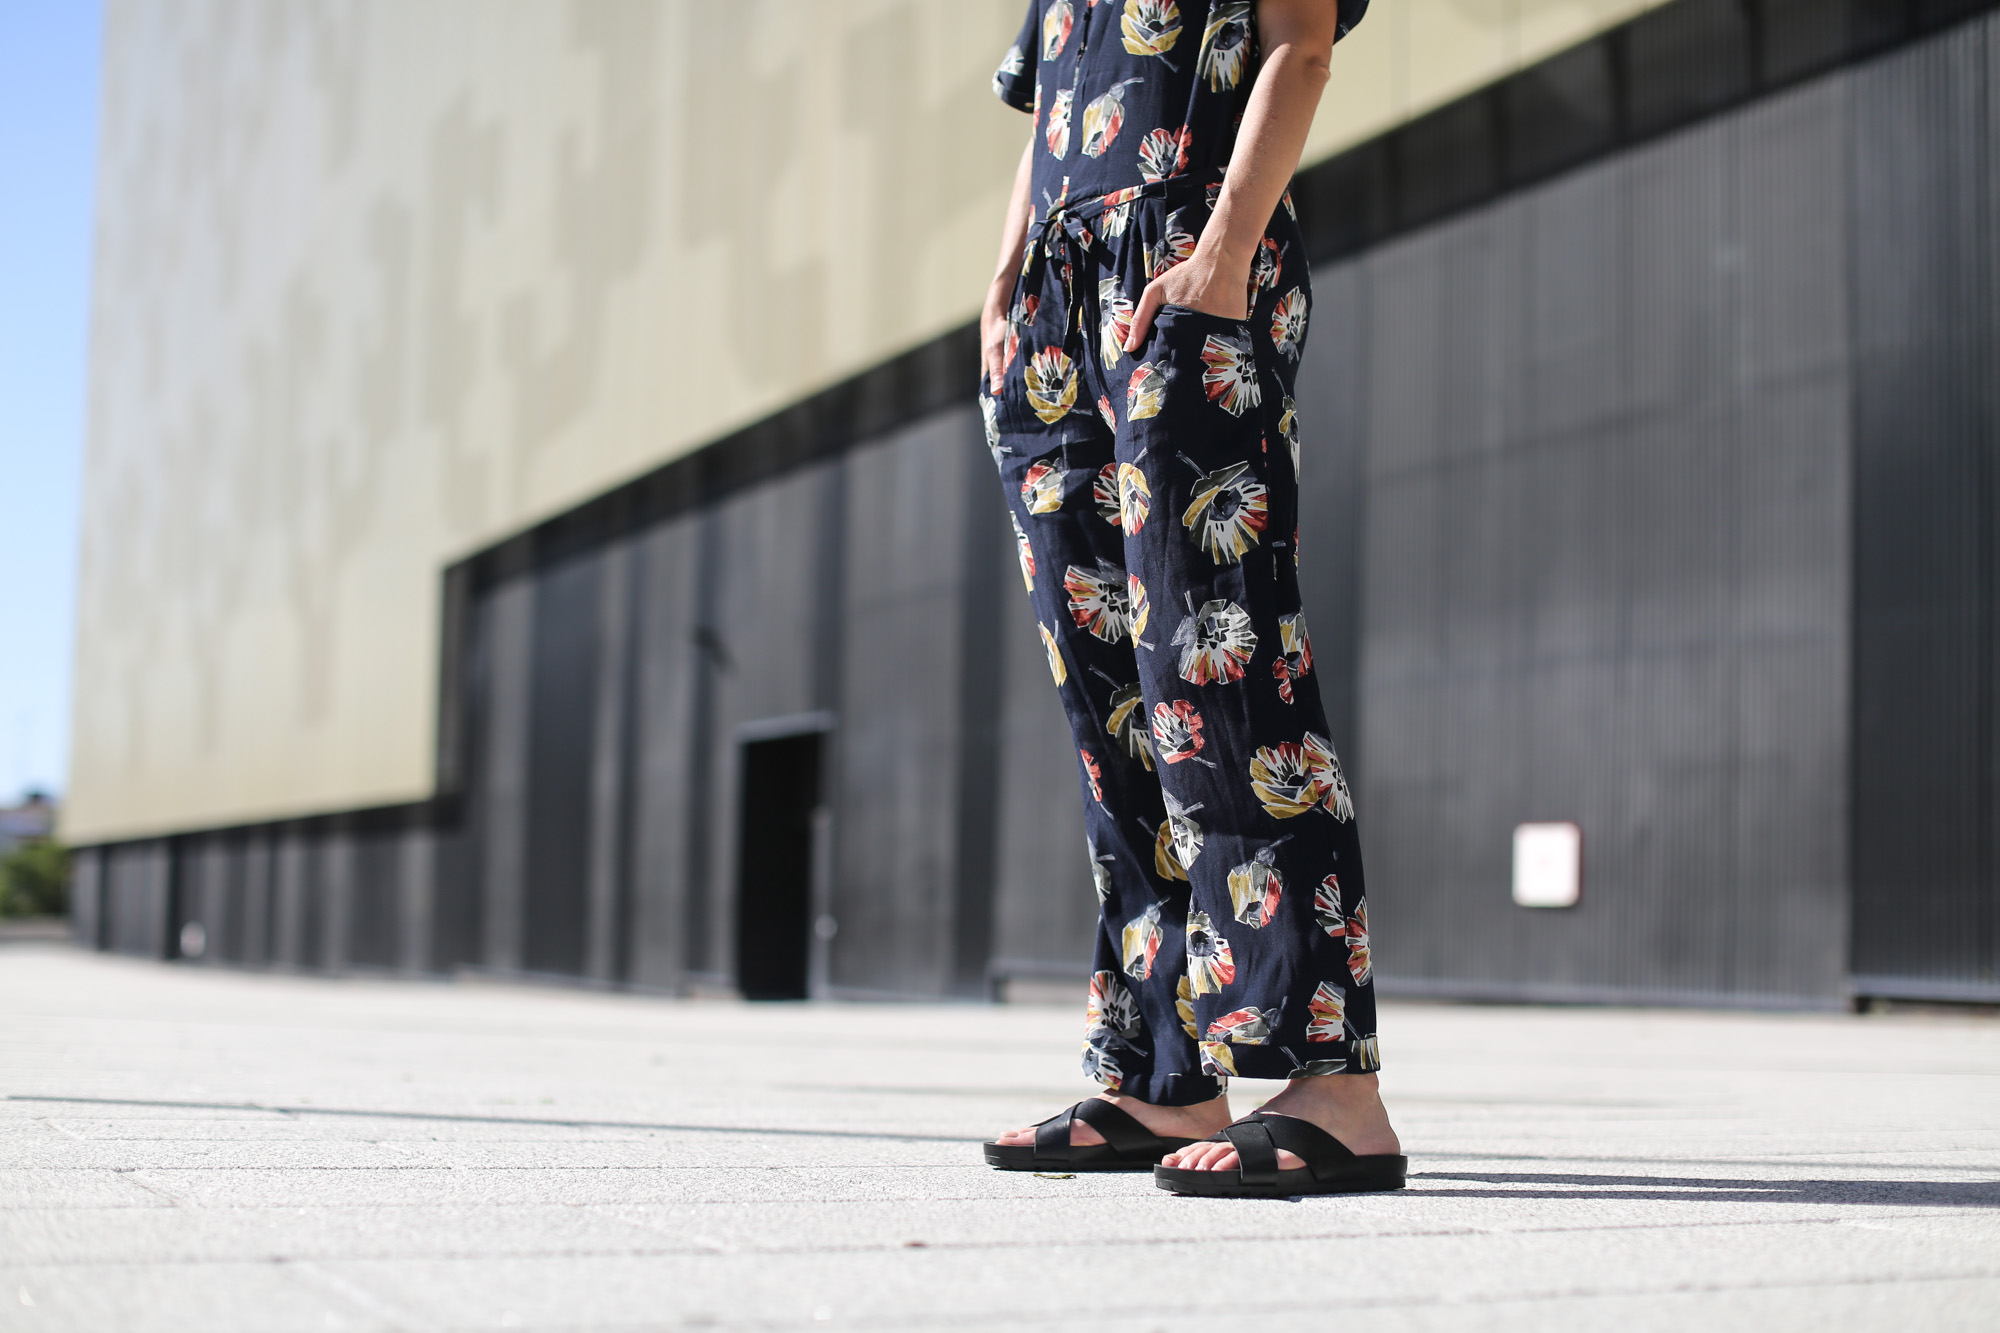 Clochet-streetstyle-vagabond-sliders-zara-flowers-jumpsuit